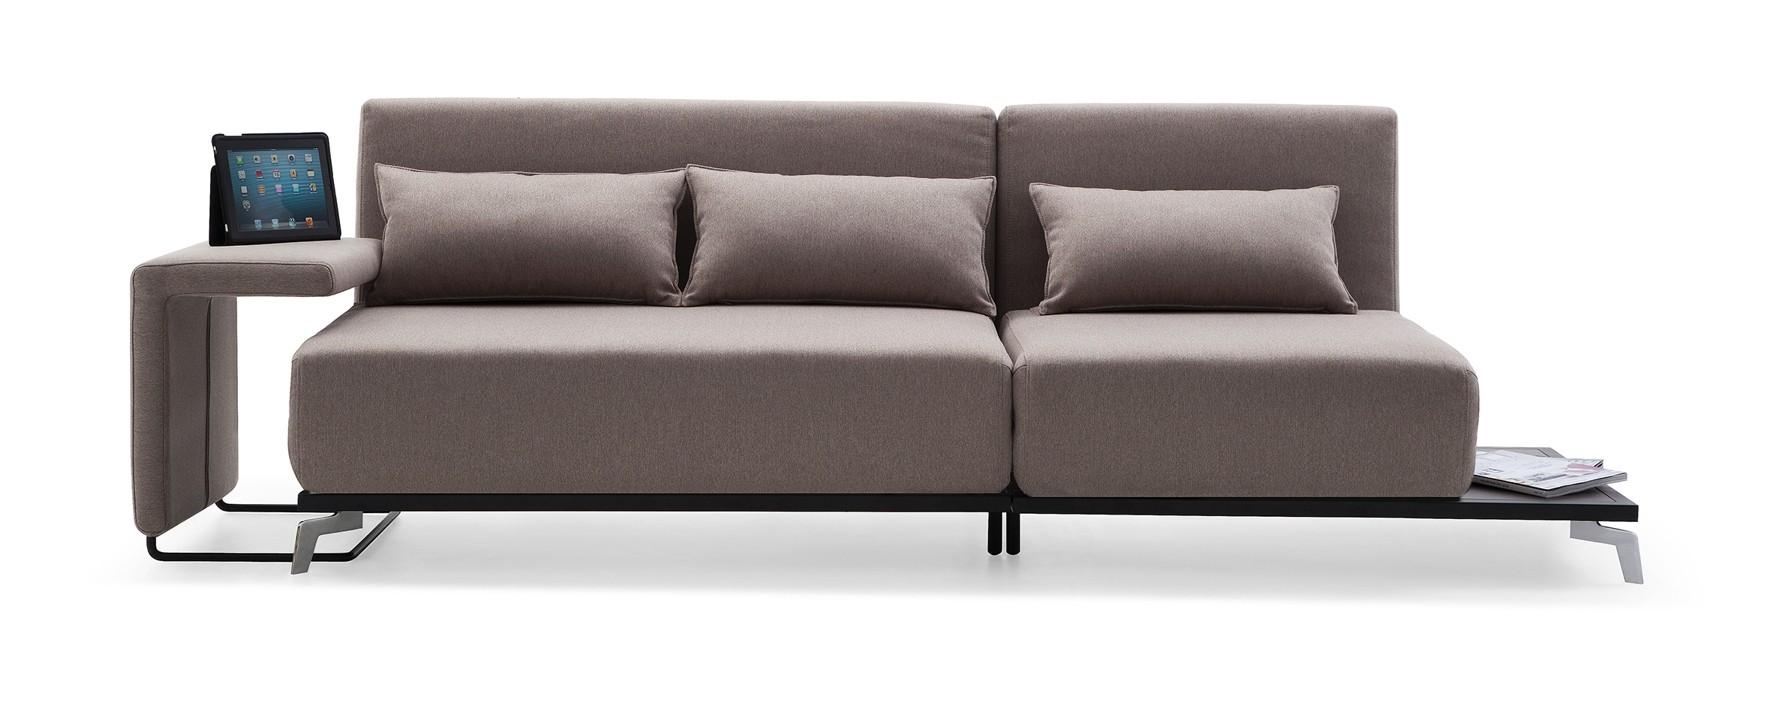 modern sofa beds cado modern furniture - jh033 modern sofa bed ... MQLRZRR